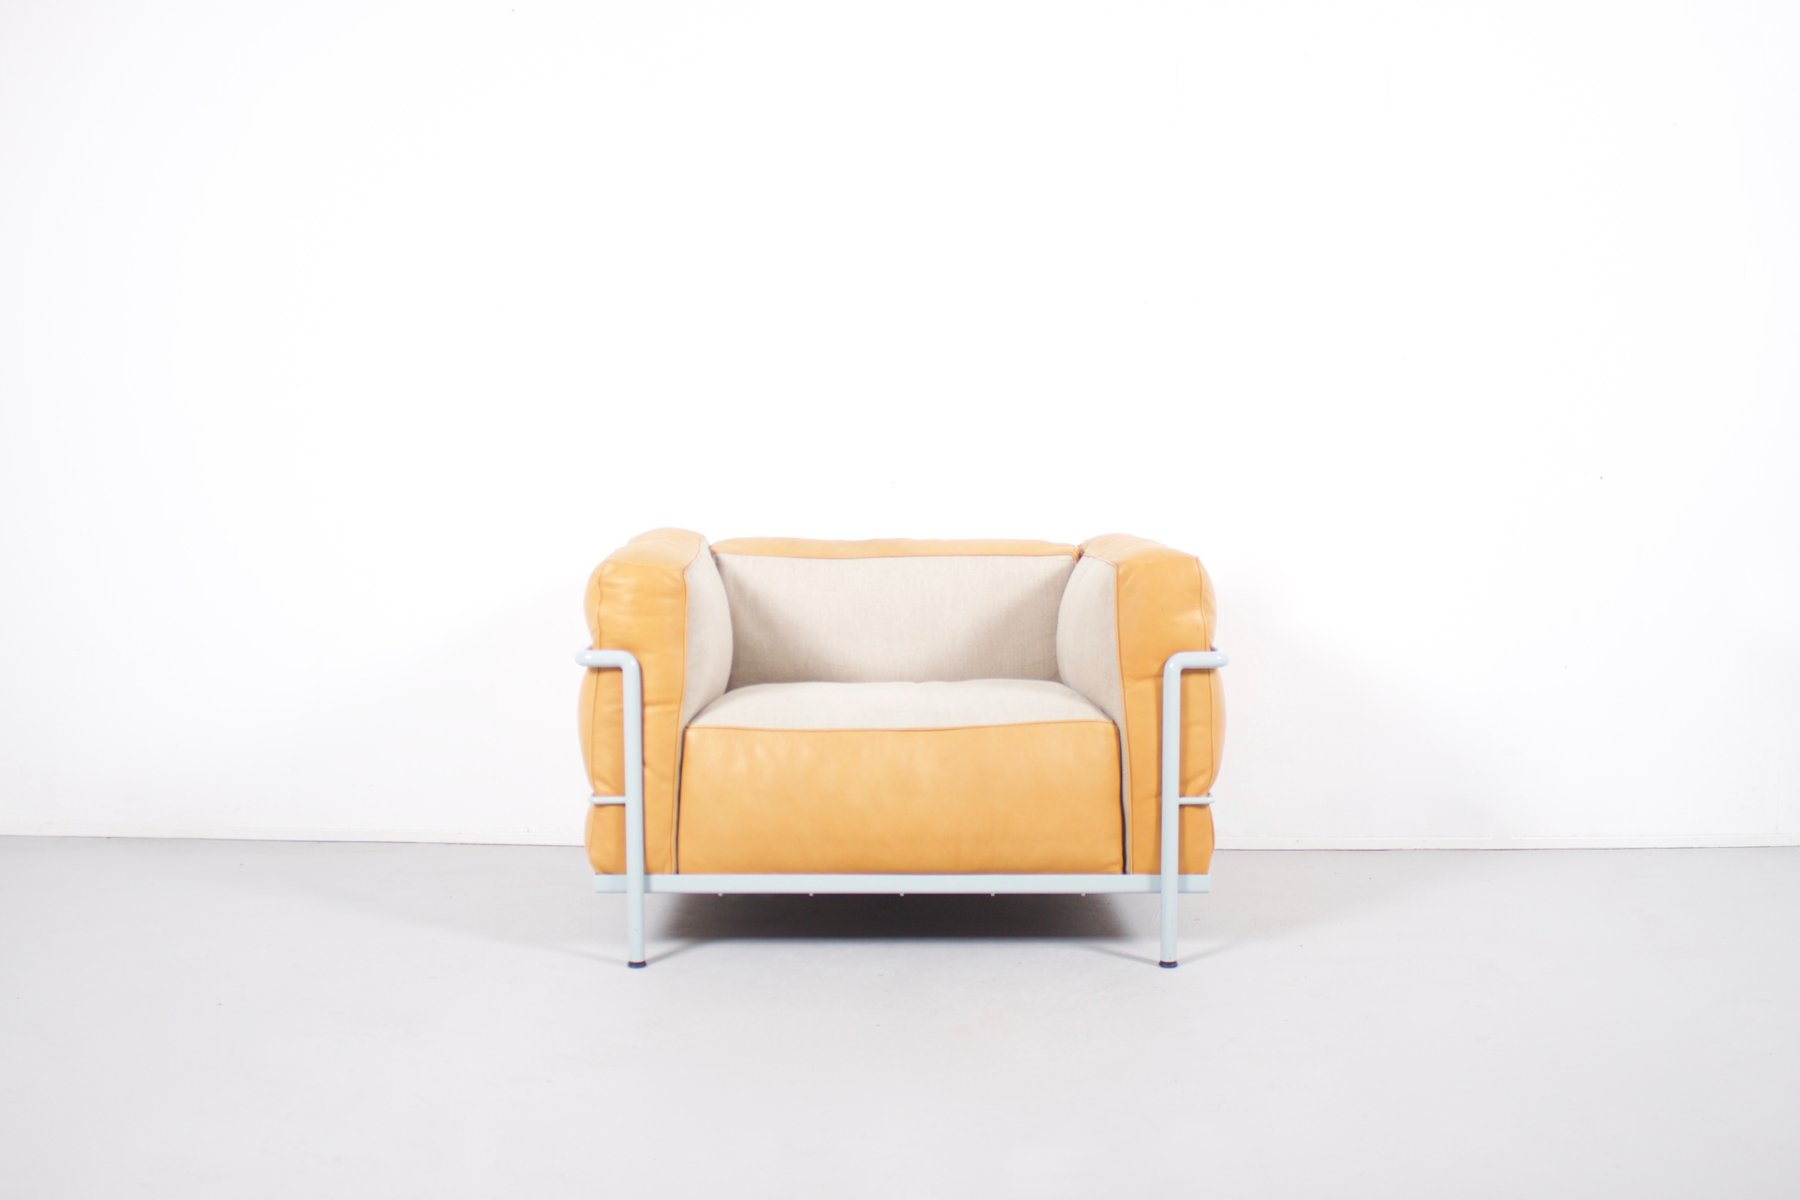 vintage lc3 grand confort stuhl von le corbusier pierre. Black Bedroom Furniture Sets. Home Design Ideas